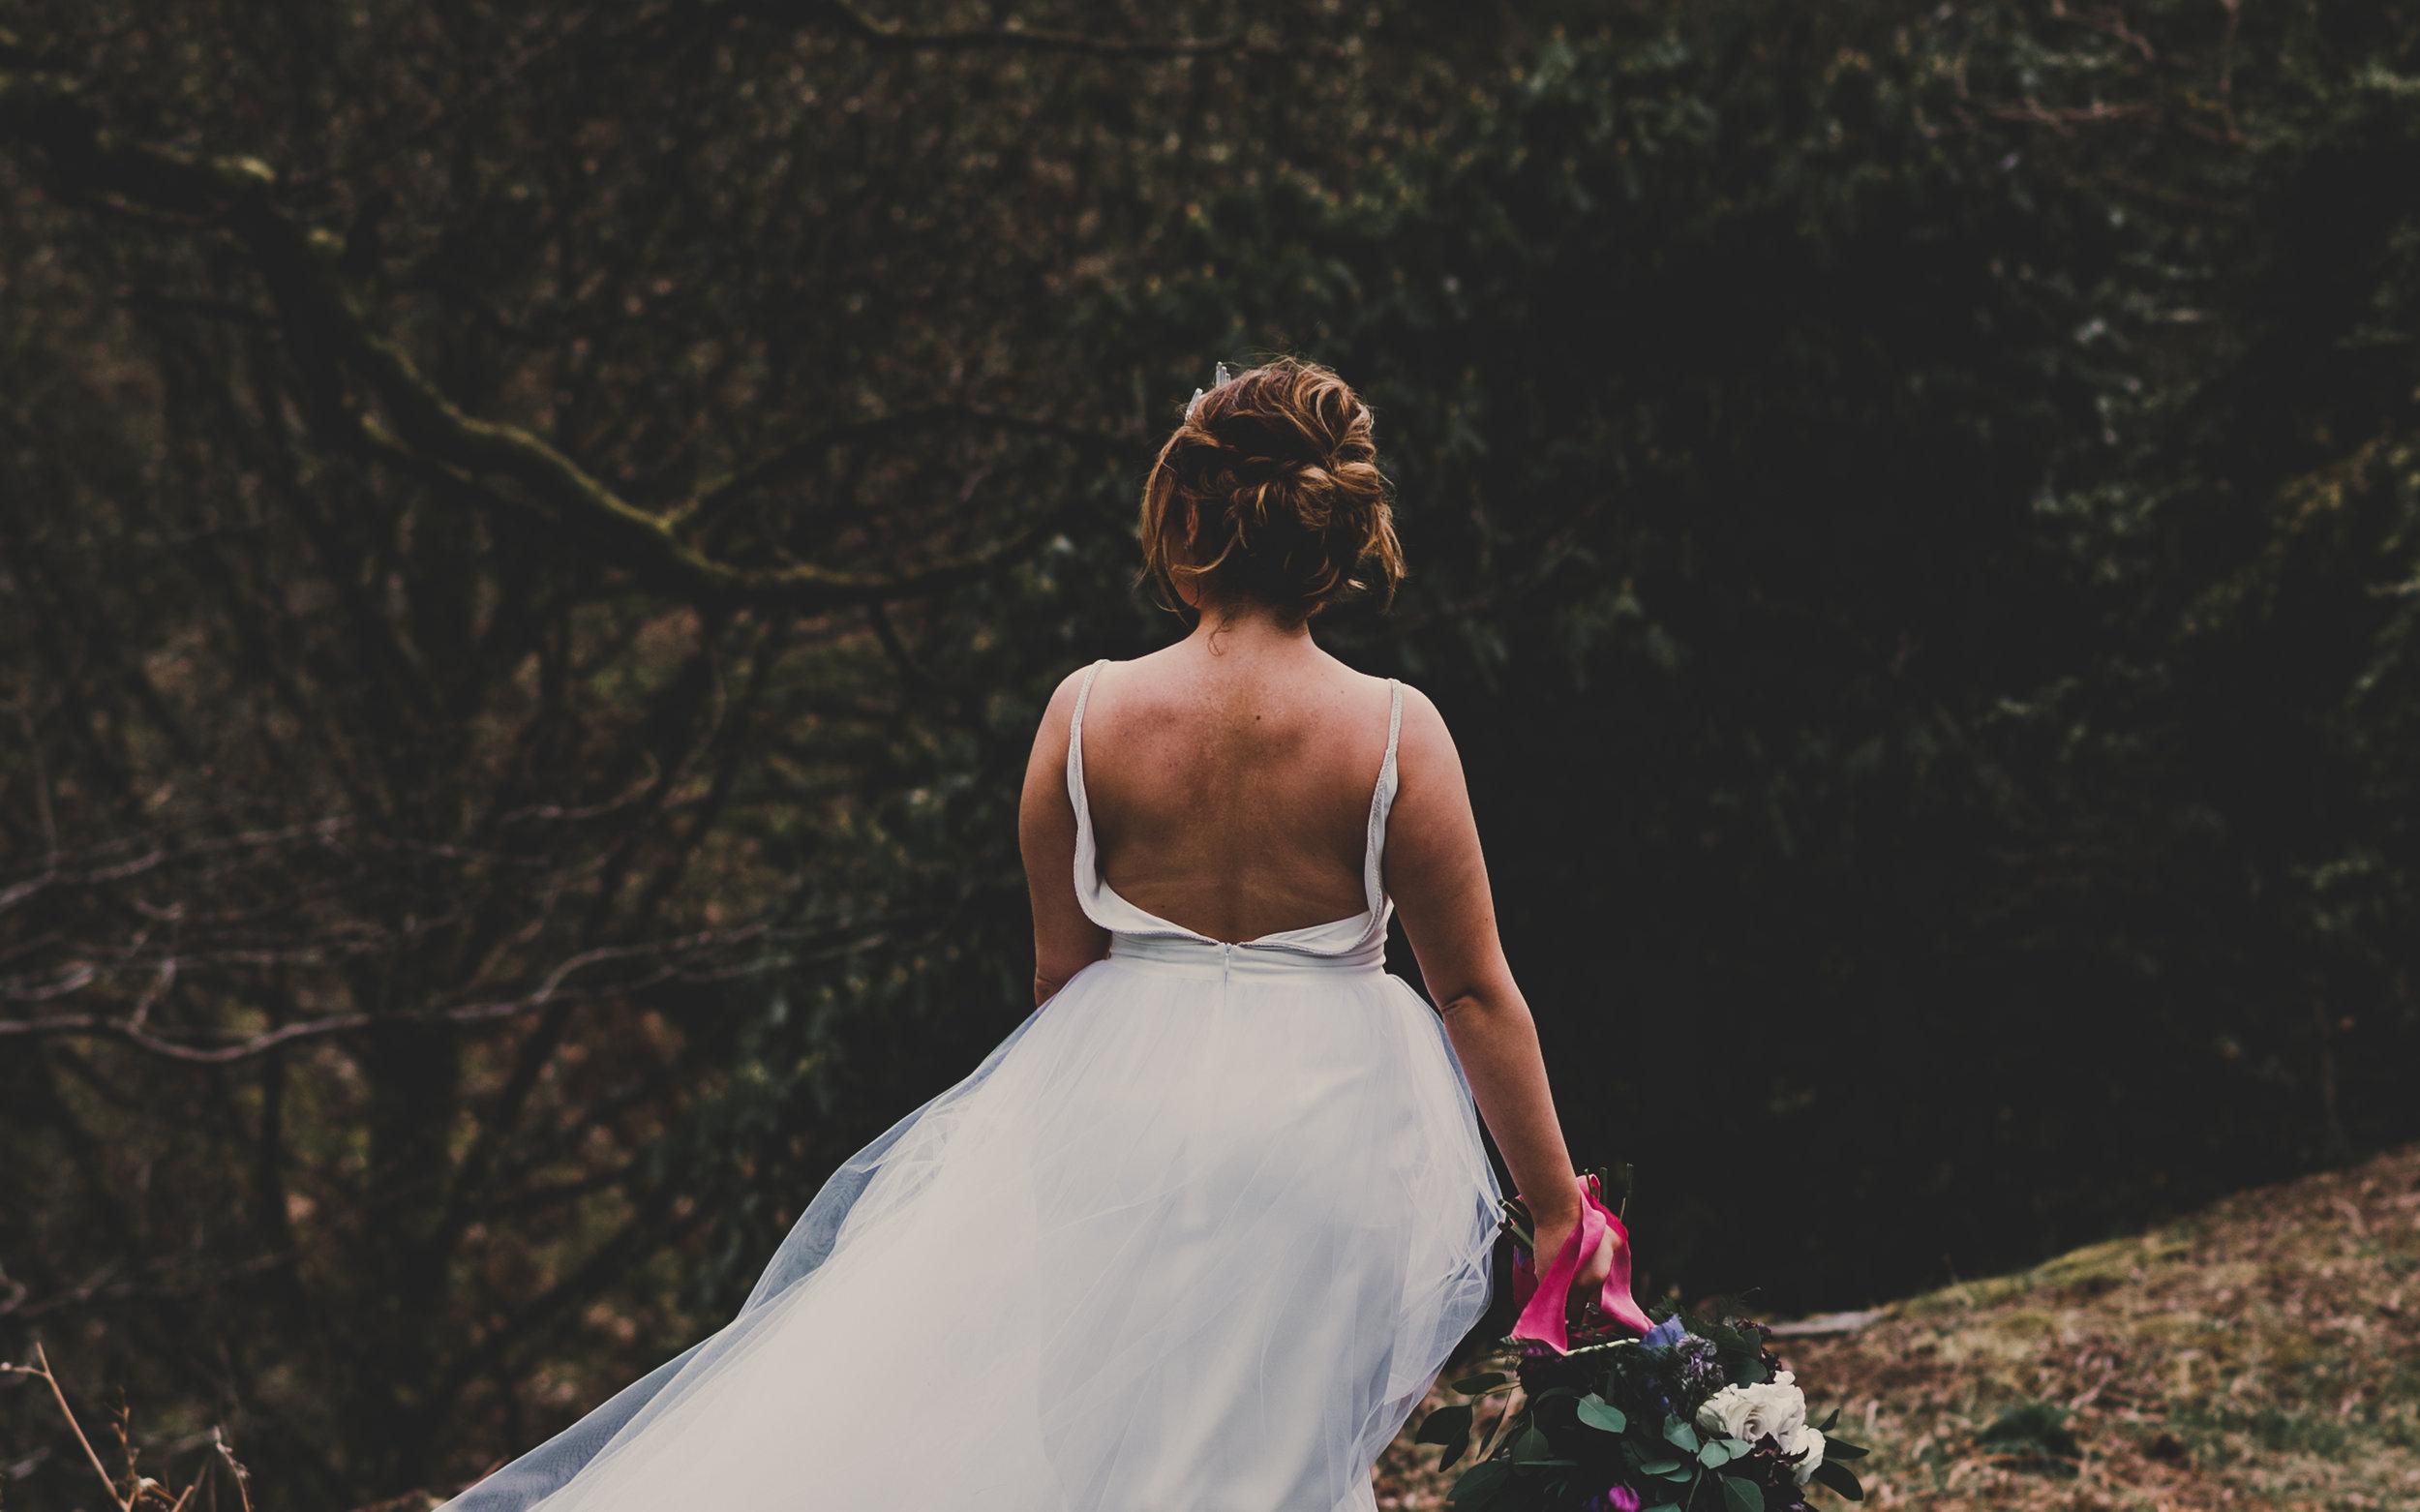 jade maguire photography wild wedding photography (11).jpg